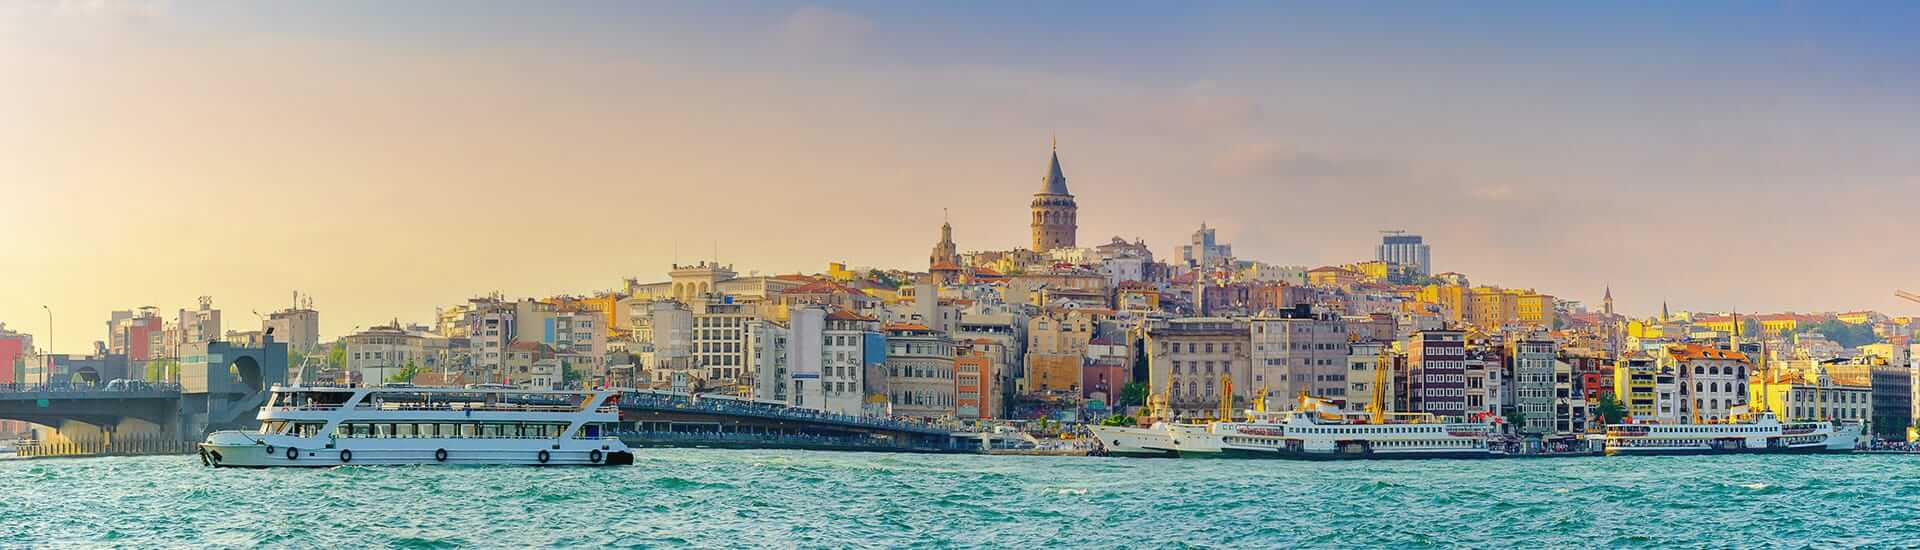 Silivri (İstanbul)